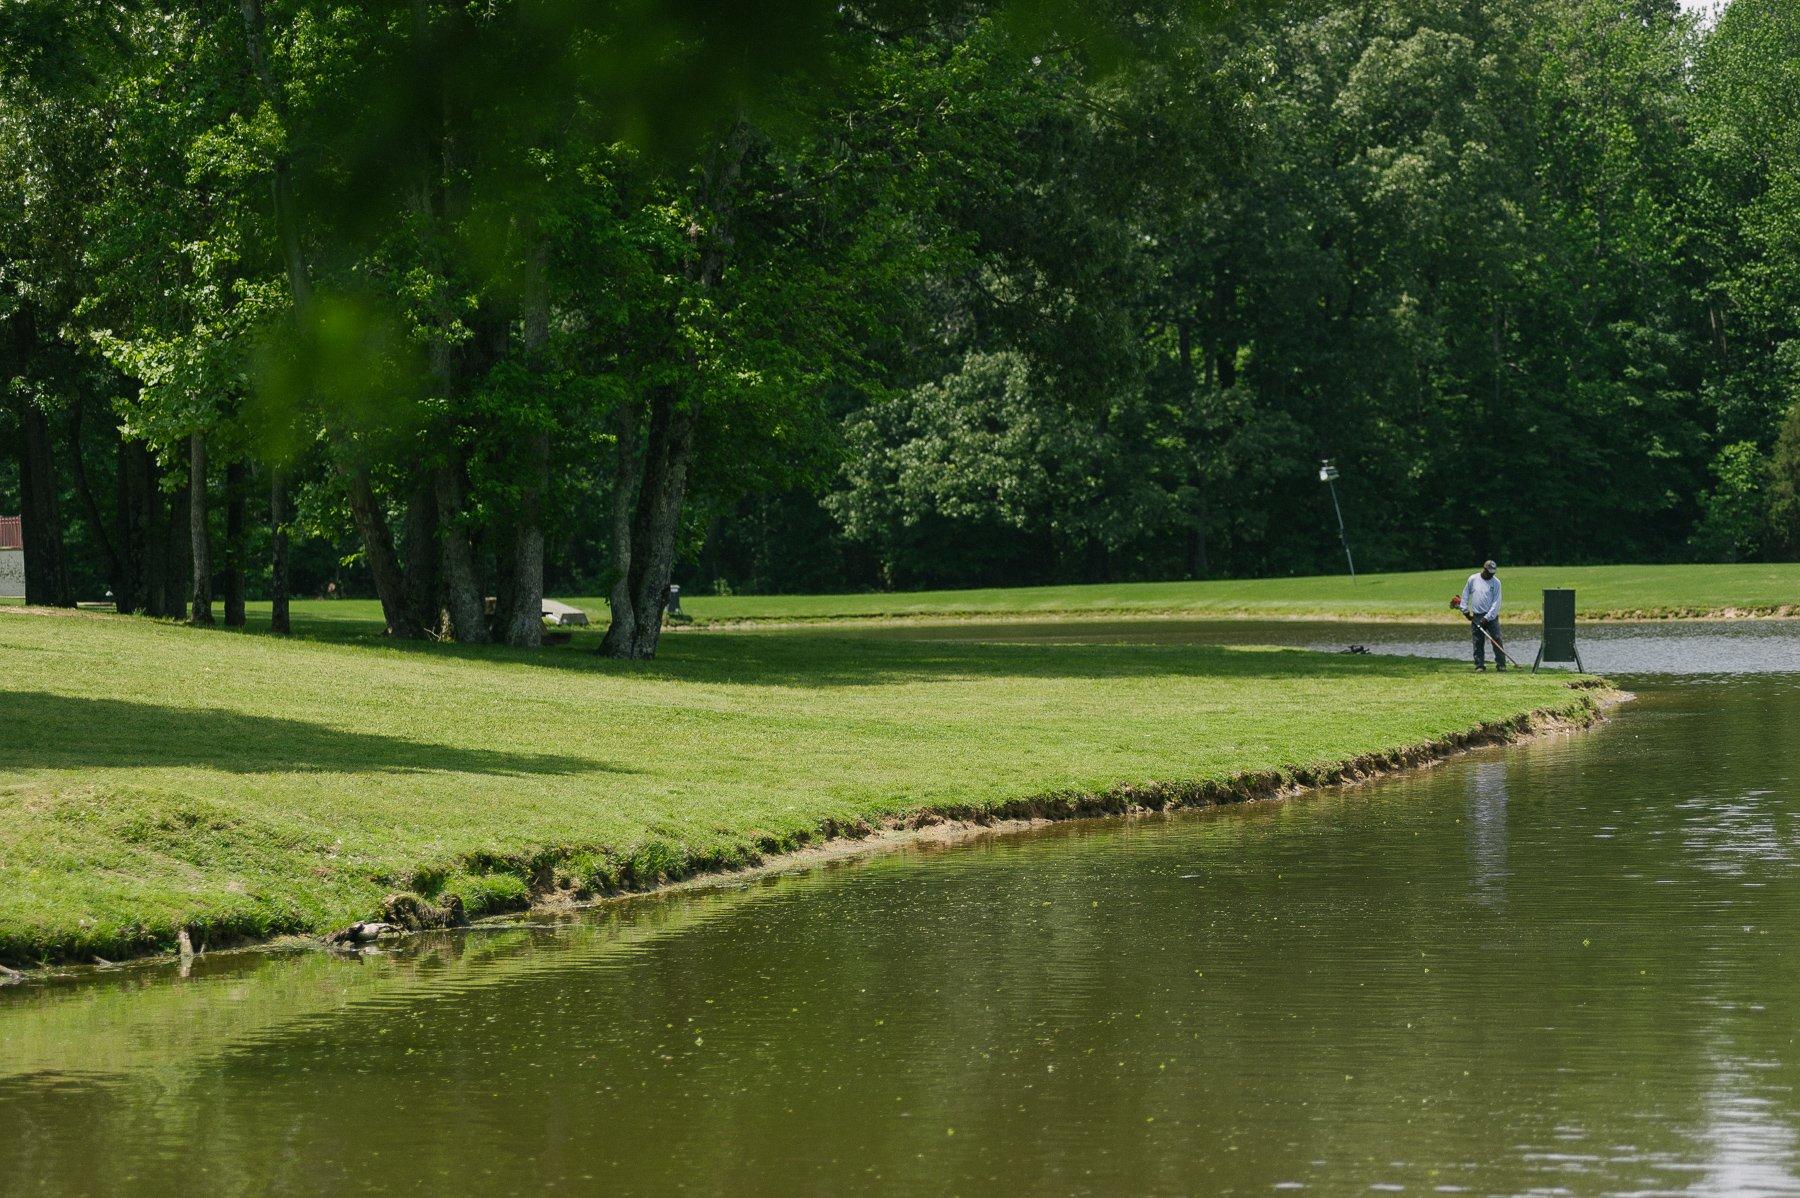 Commercial pond maintenance